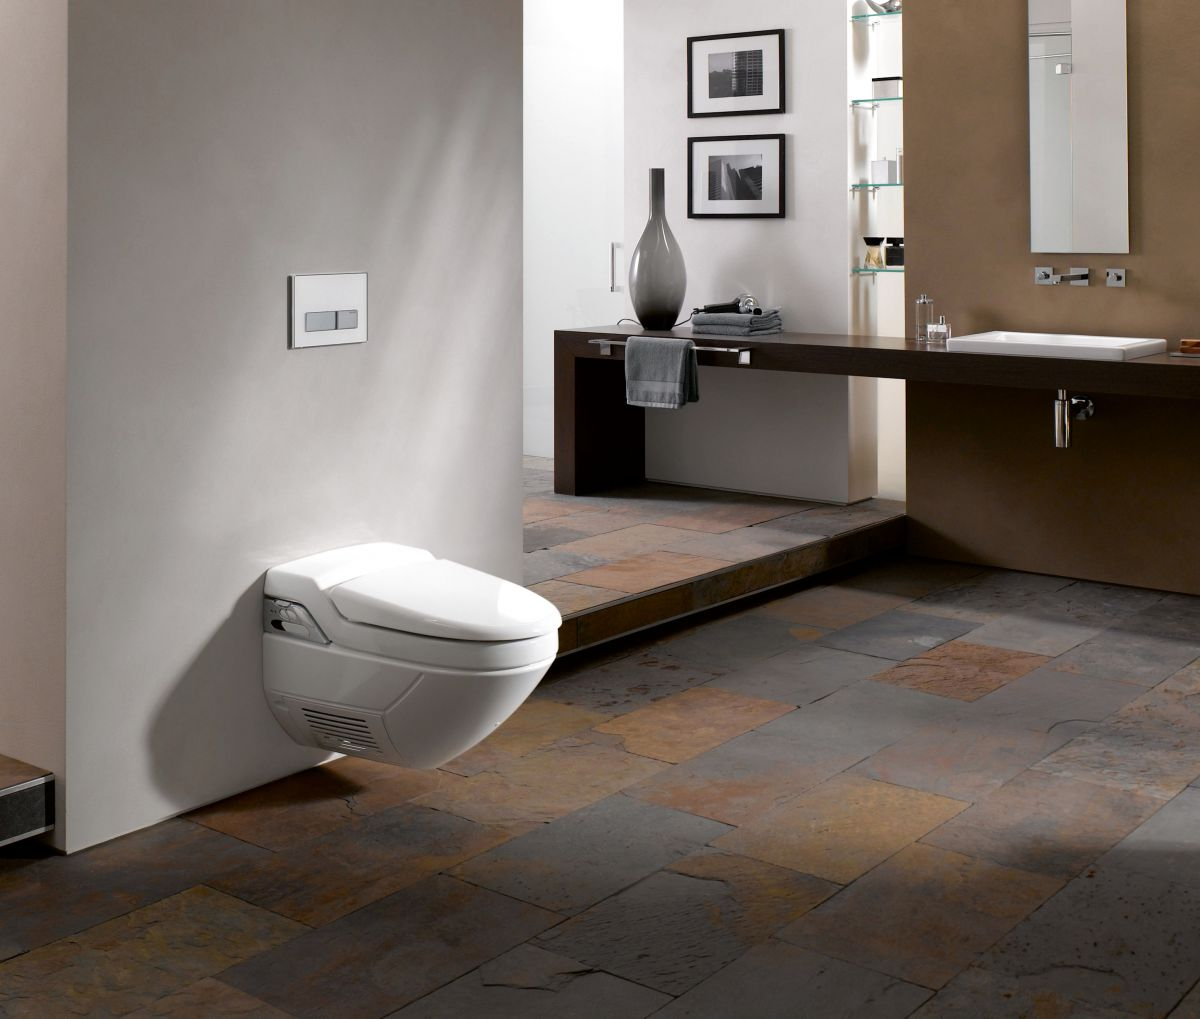 geberit aquaclean 8000 plus shower toilet uk bathrooms. Black Bedroom Furniture Sets. Home Design Ideas